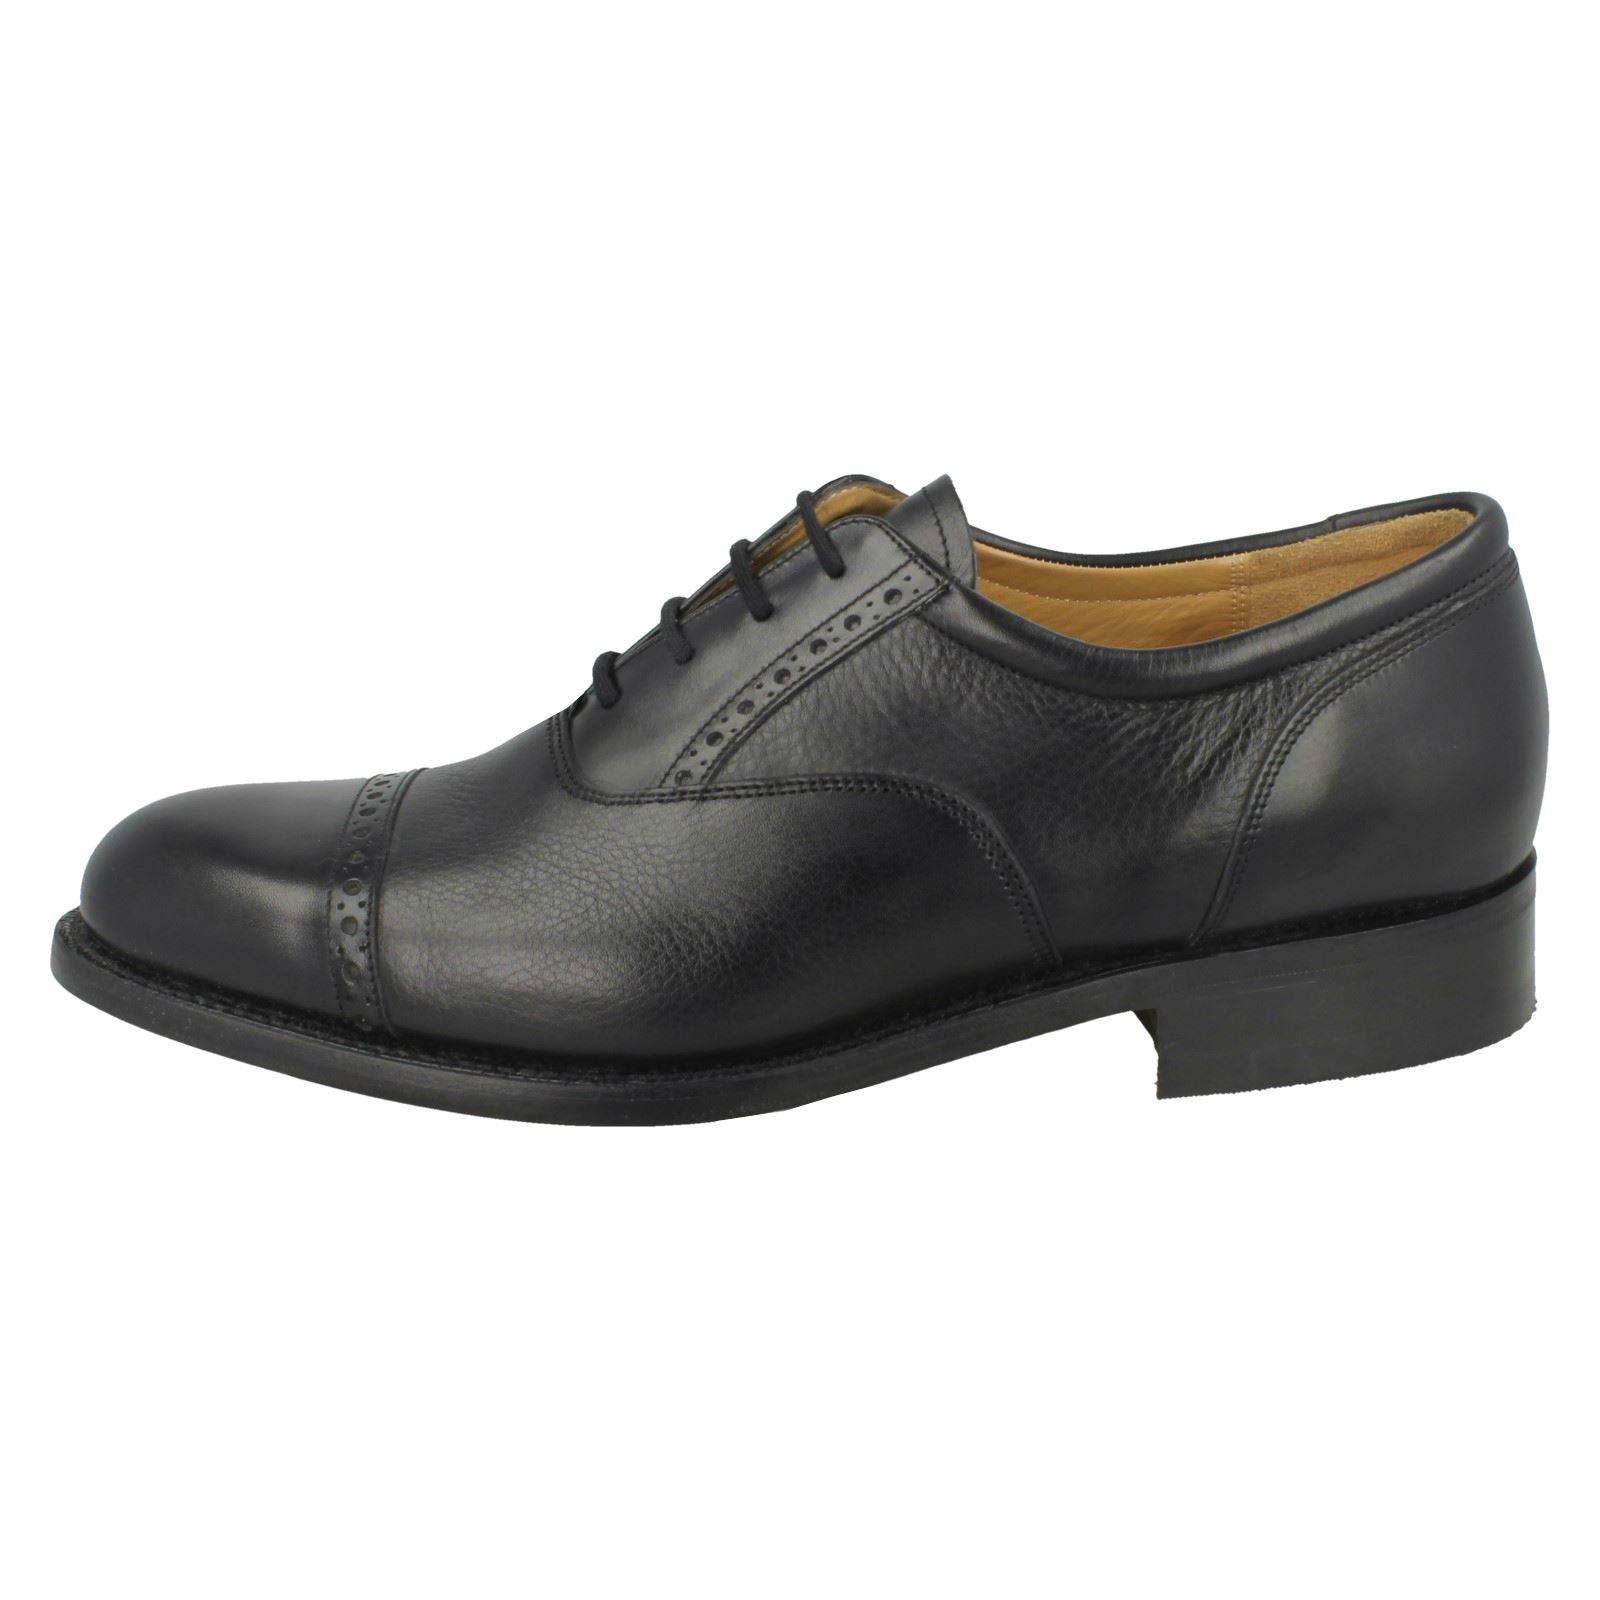 Formal Uomo Barker Formal  Lace Up Schuhes Shoreham 303c2d